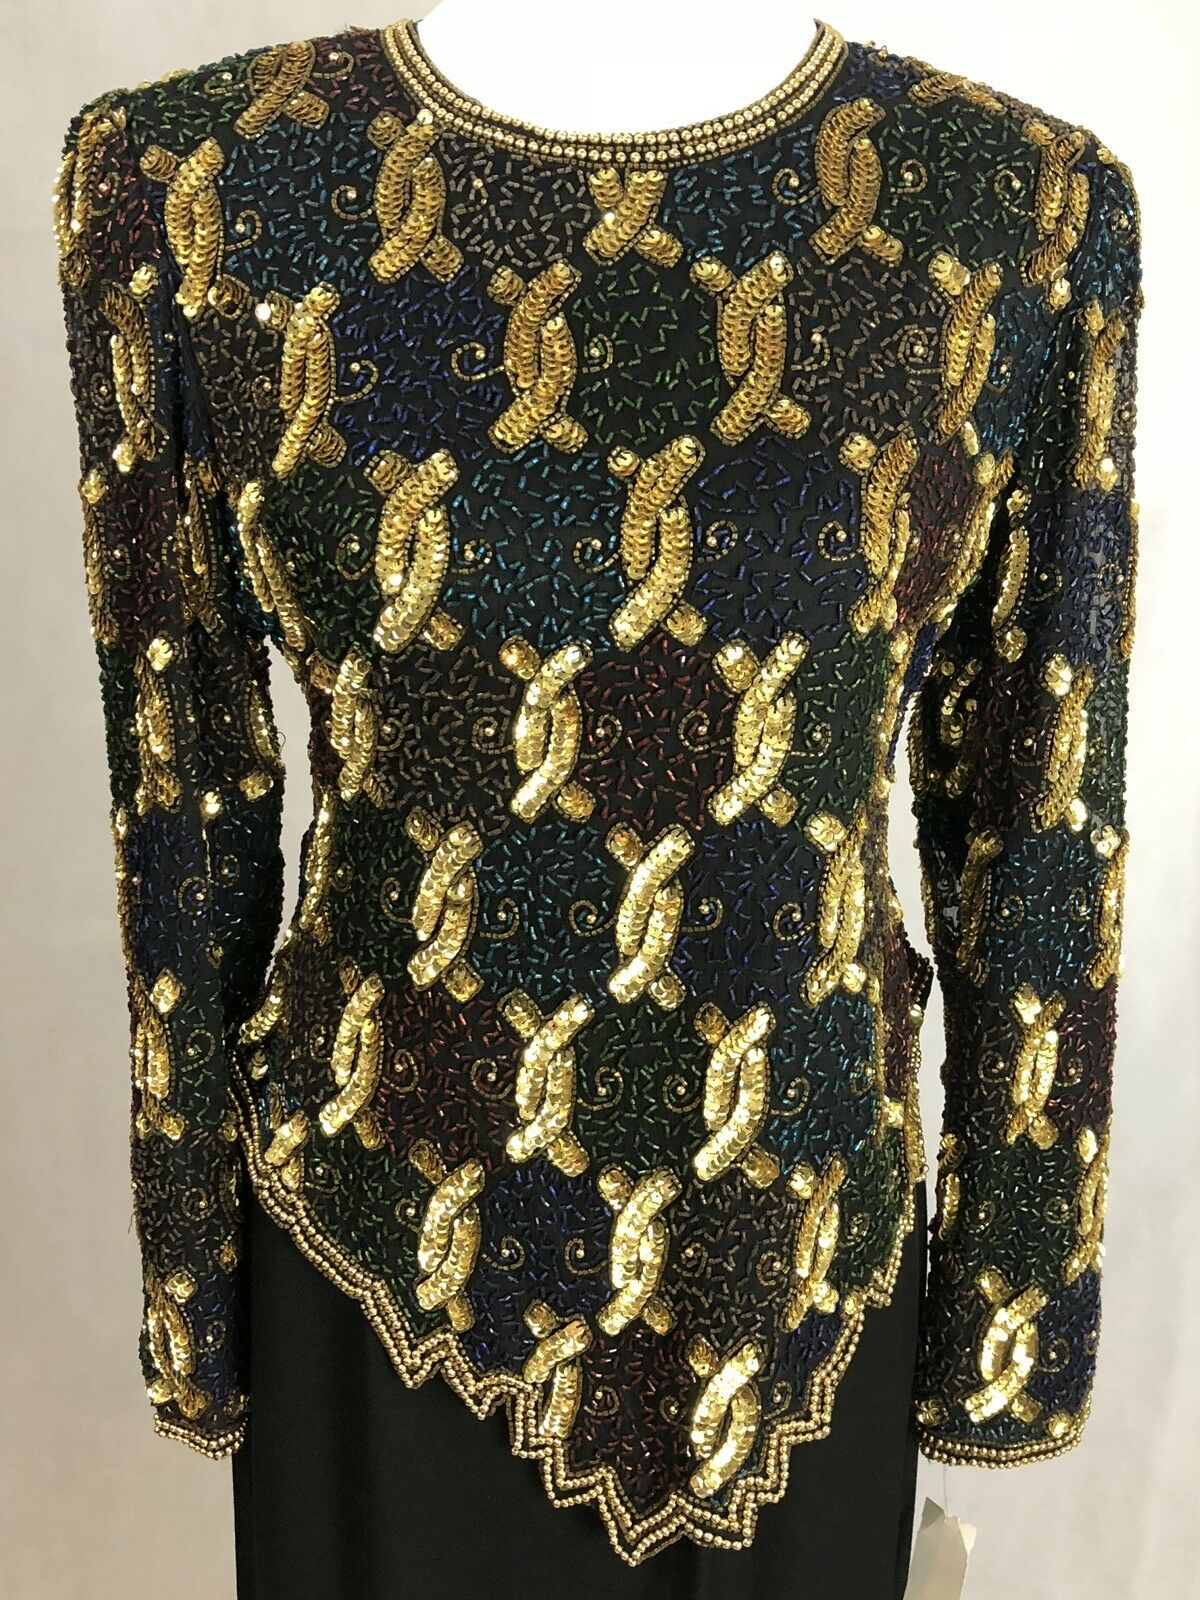 Lawrence Kazar Medium 100% Silk Gold schwarz Beaded Evening Top & Med schwarz Skirt